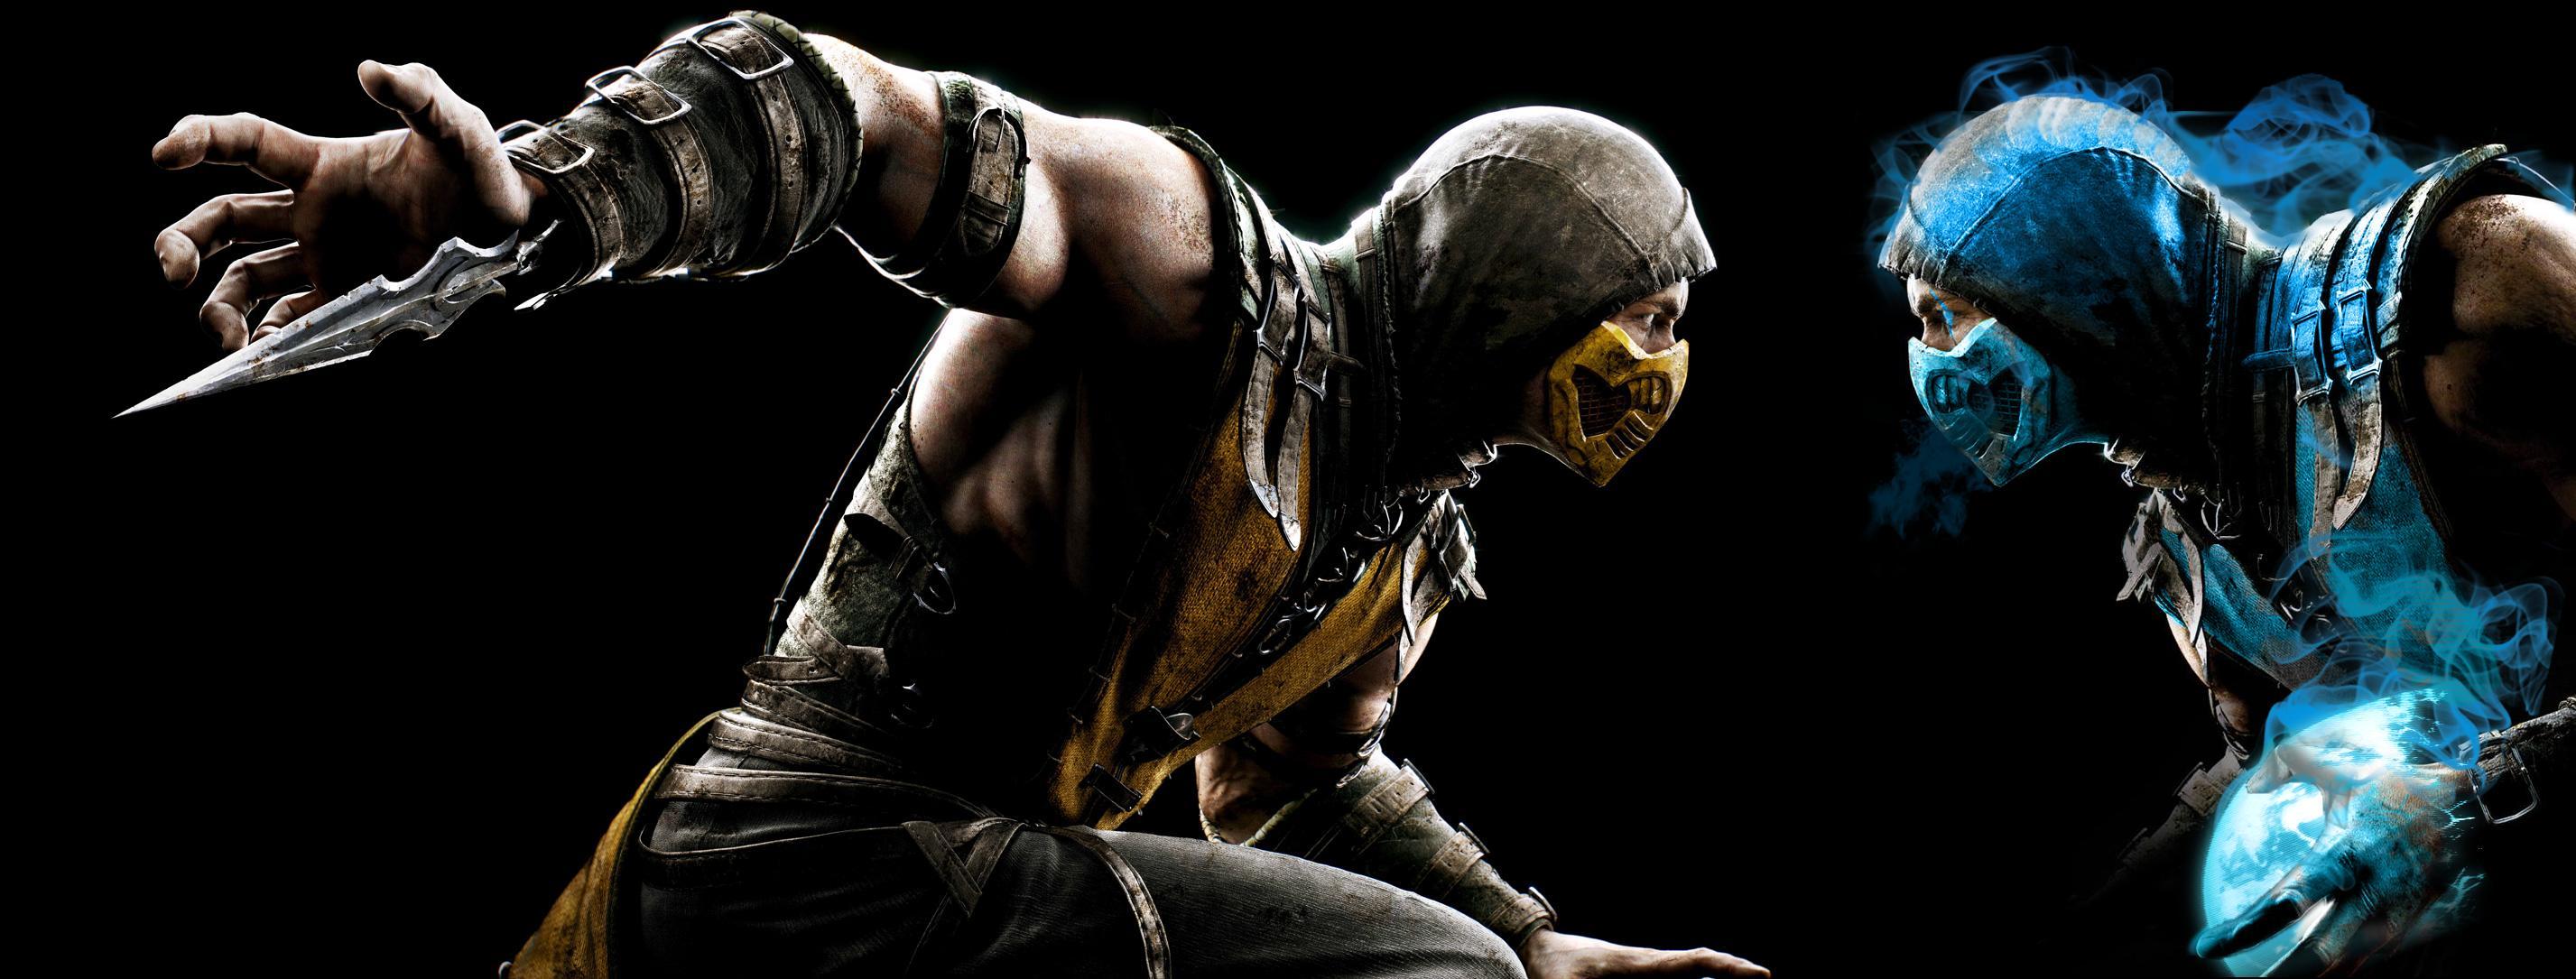 Mortal Kombat X Scorpion Vs Sub Zero By Mkfan786 On Deviantart